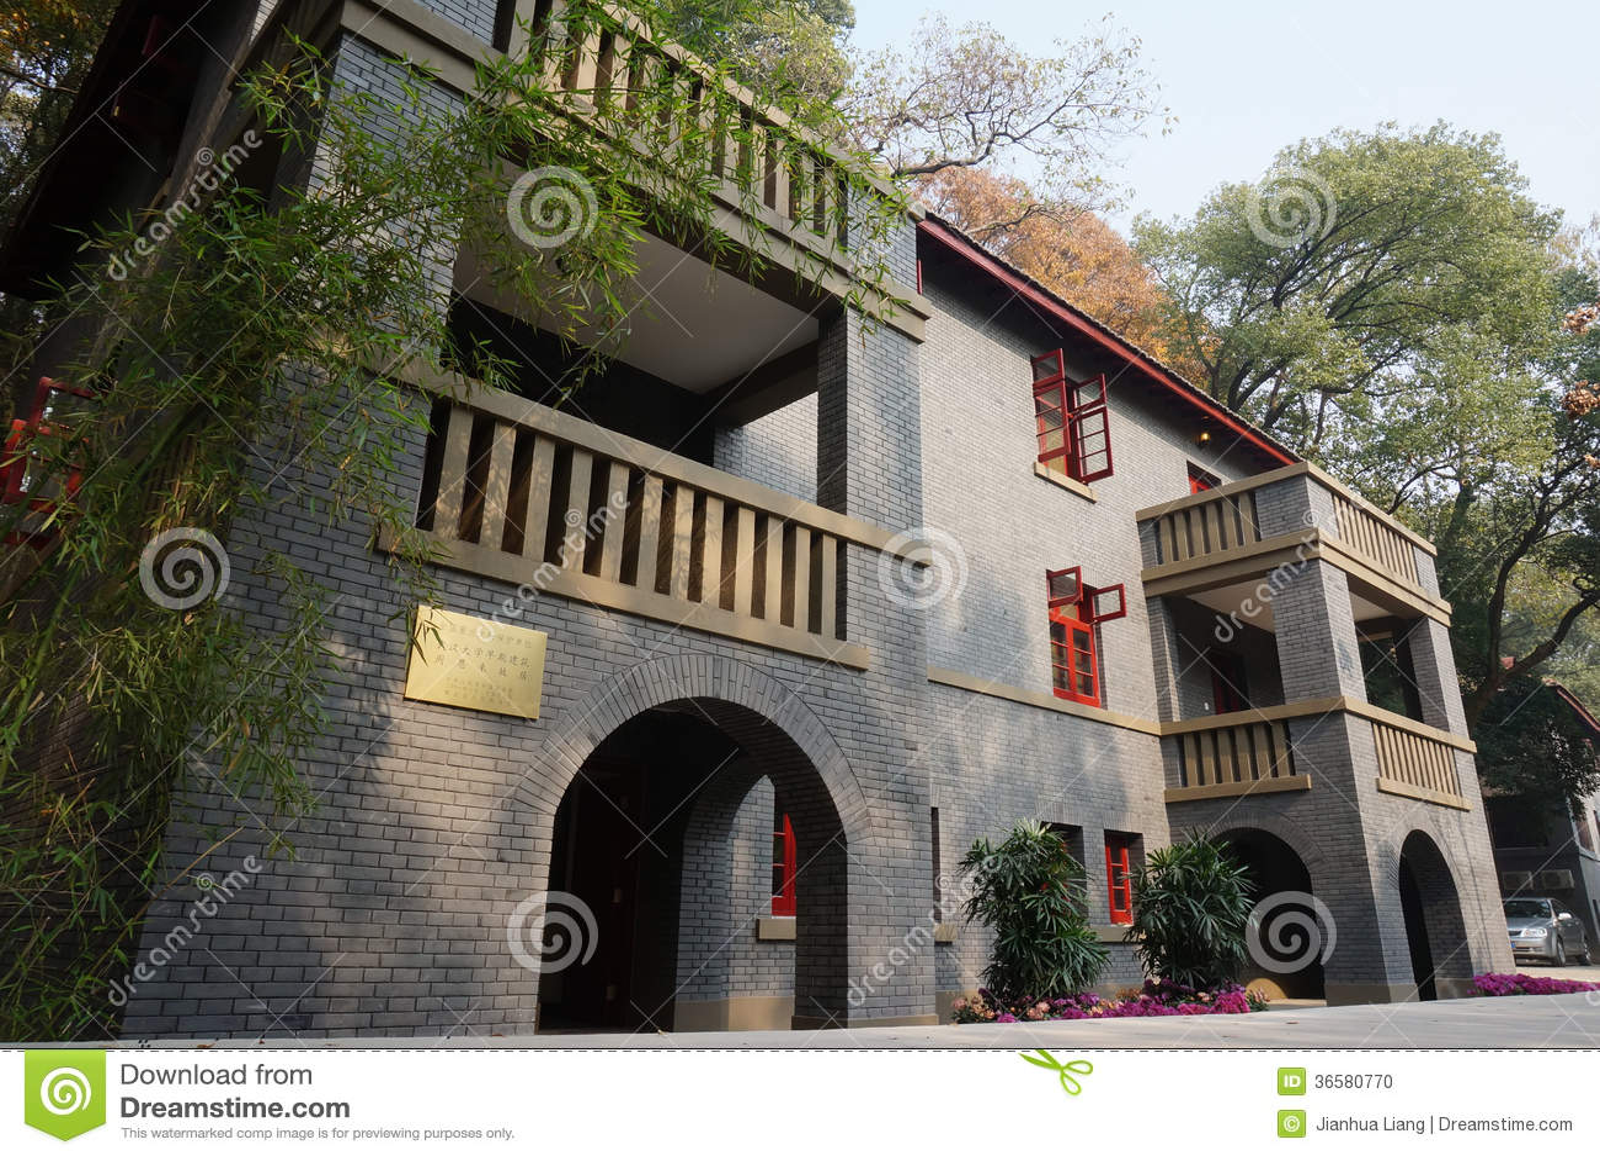 The former residence of Zhou Enlai in Wuhan University